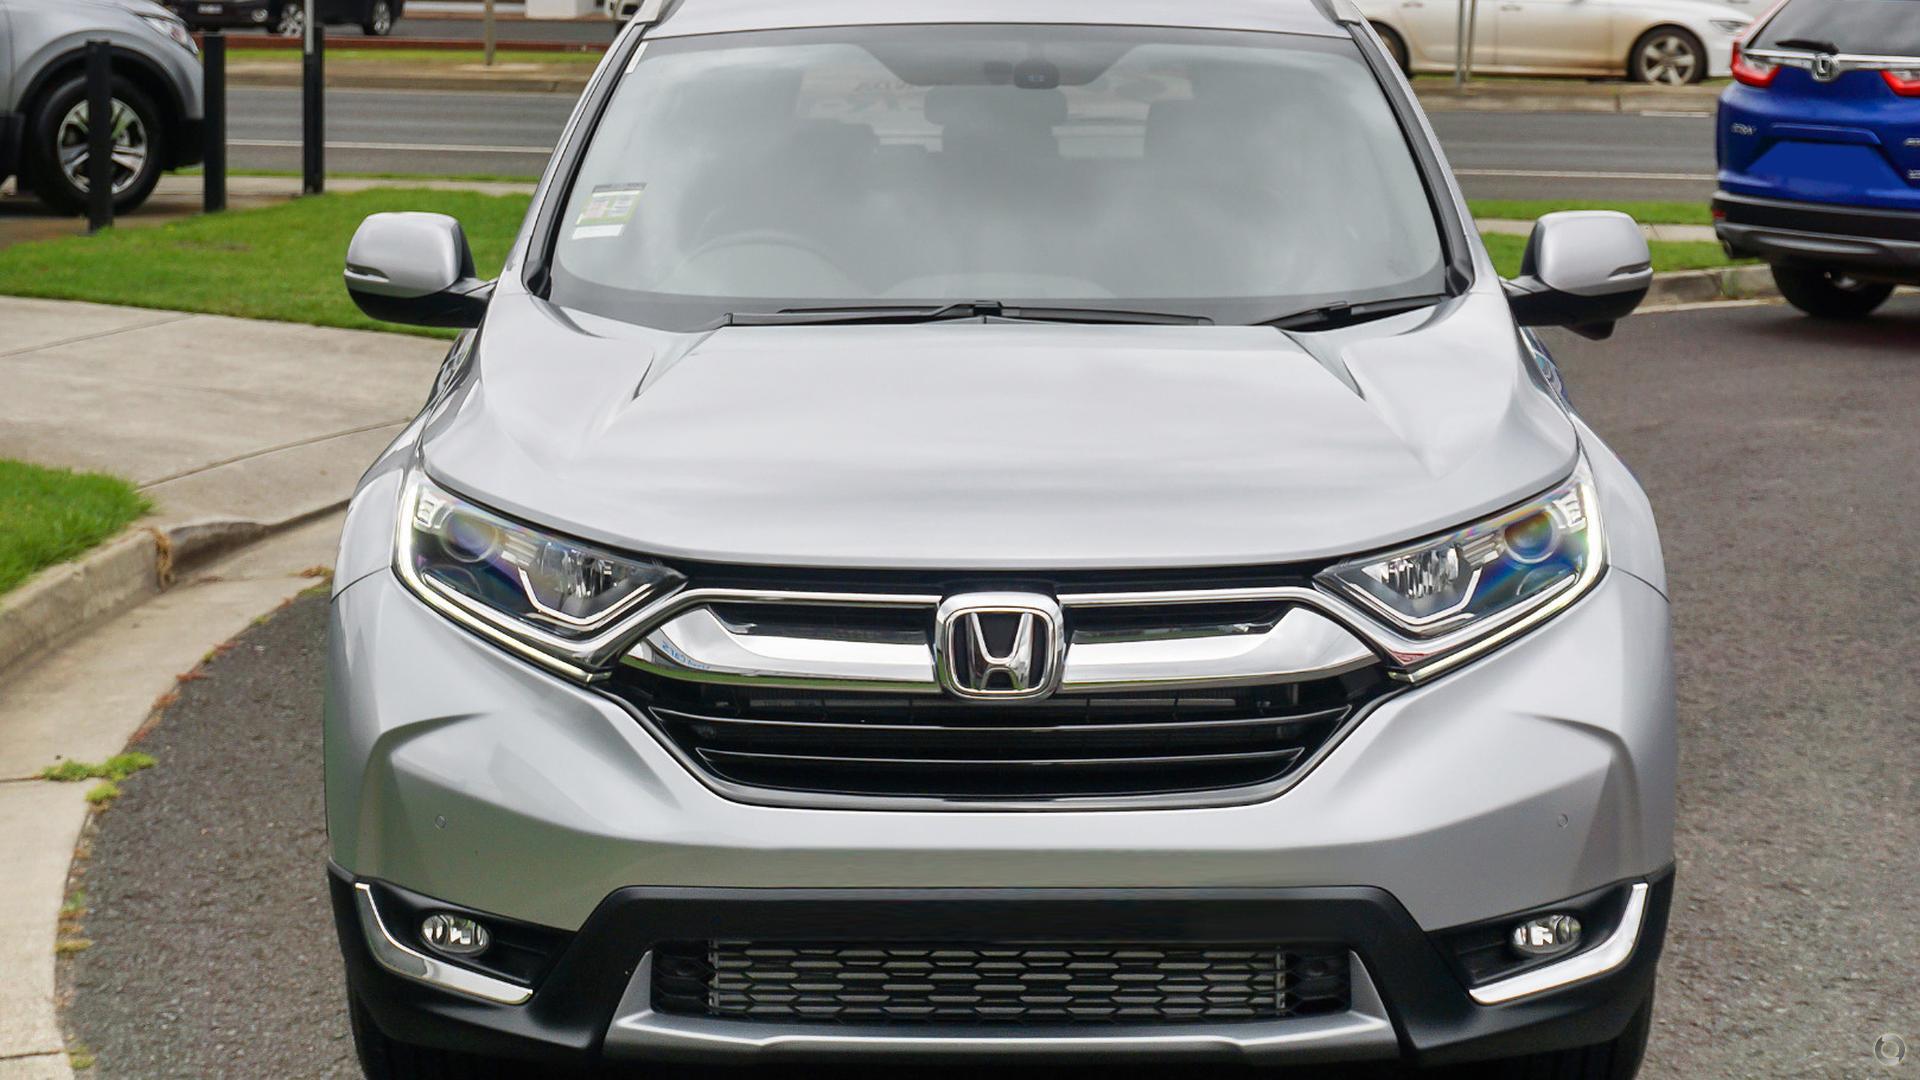 2018 Honda Cr-v RW